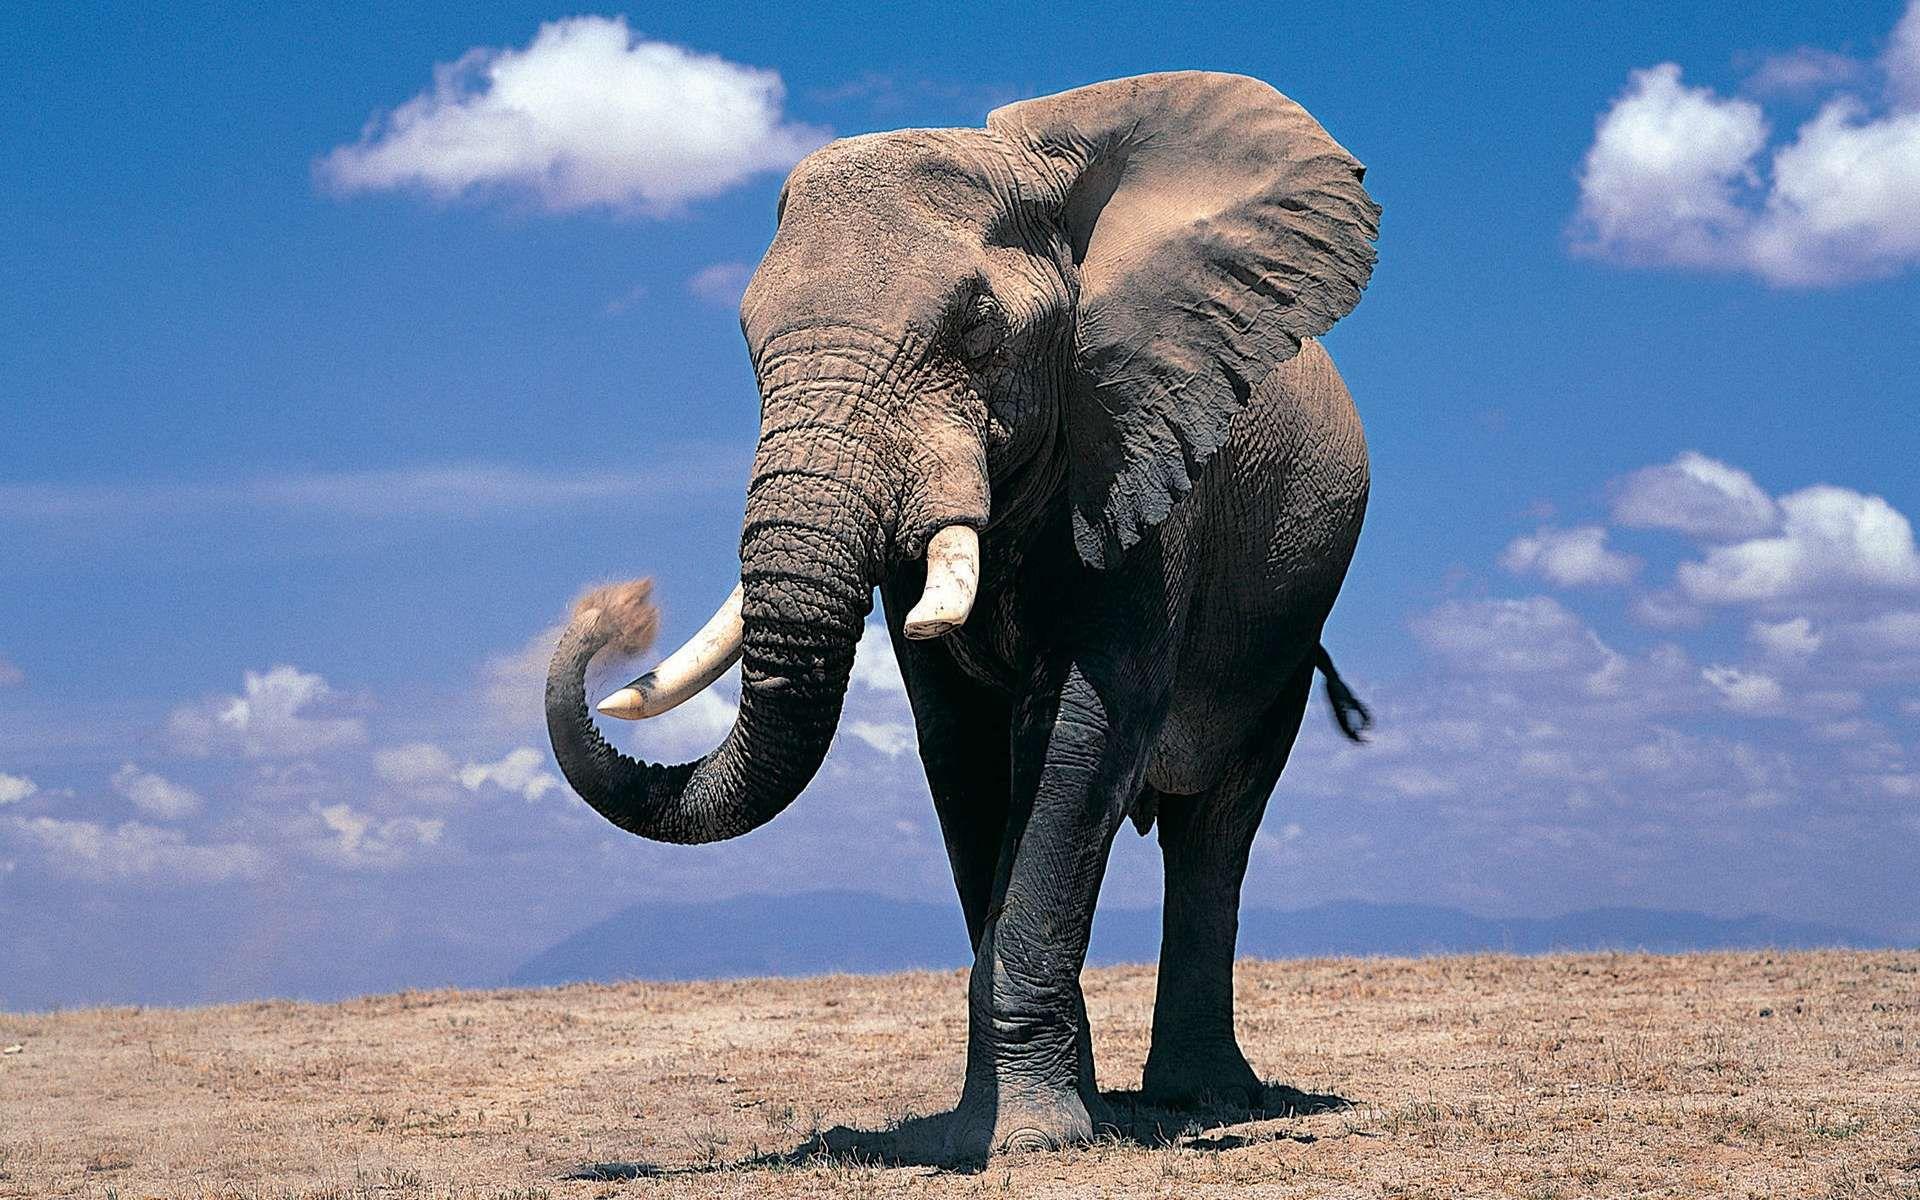 Elephant Hd Wallpapers Backgrounds Wallpaper 1280 800 Elephant Wallpapers 42 Wallpapers Adorable Wallpap Elephant Images Elephants Photos Elephant Facts